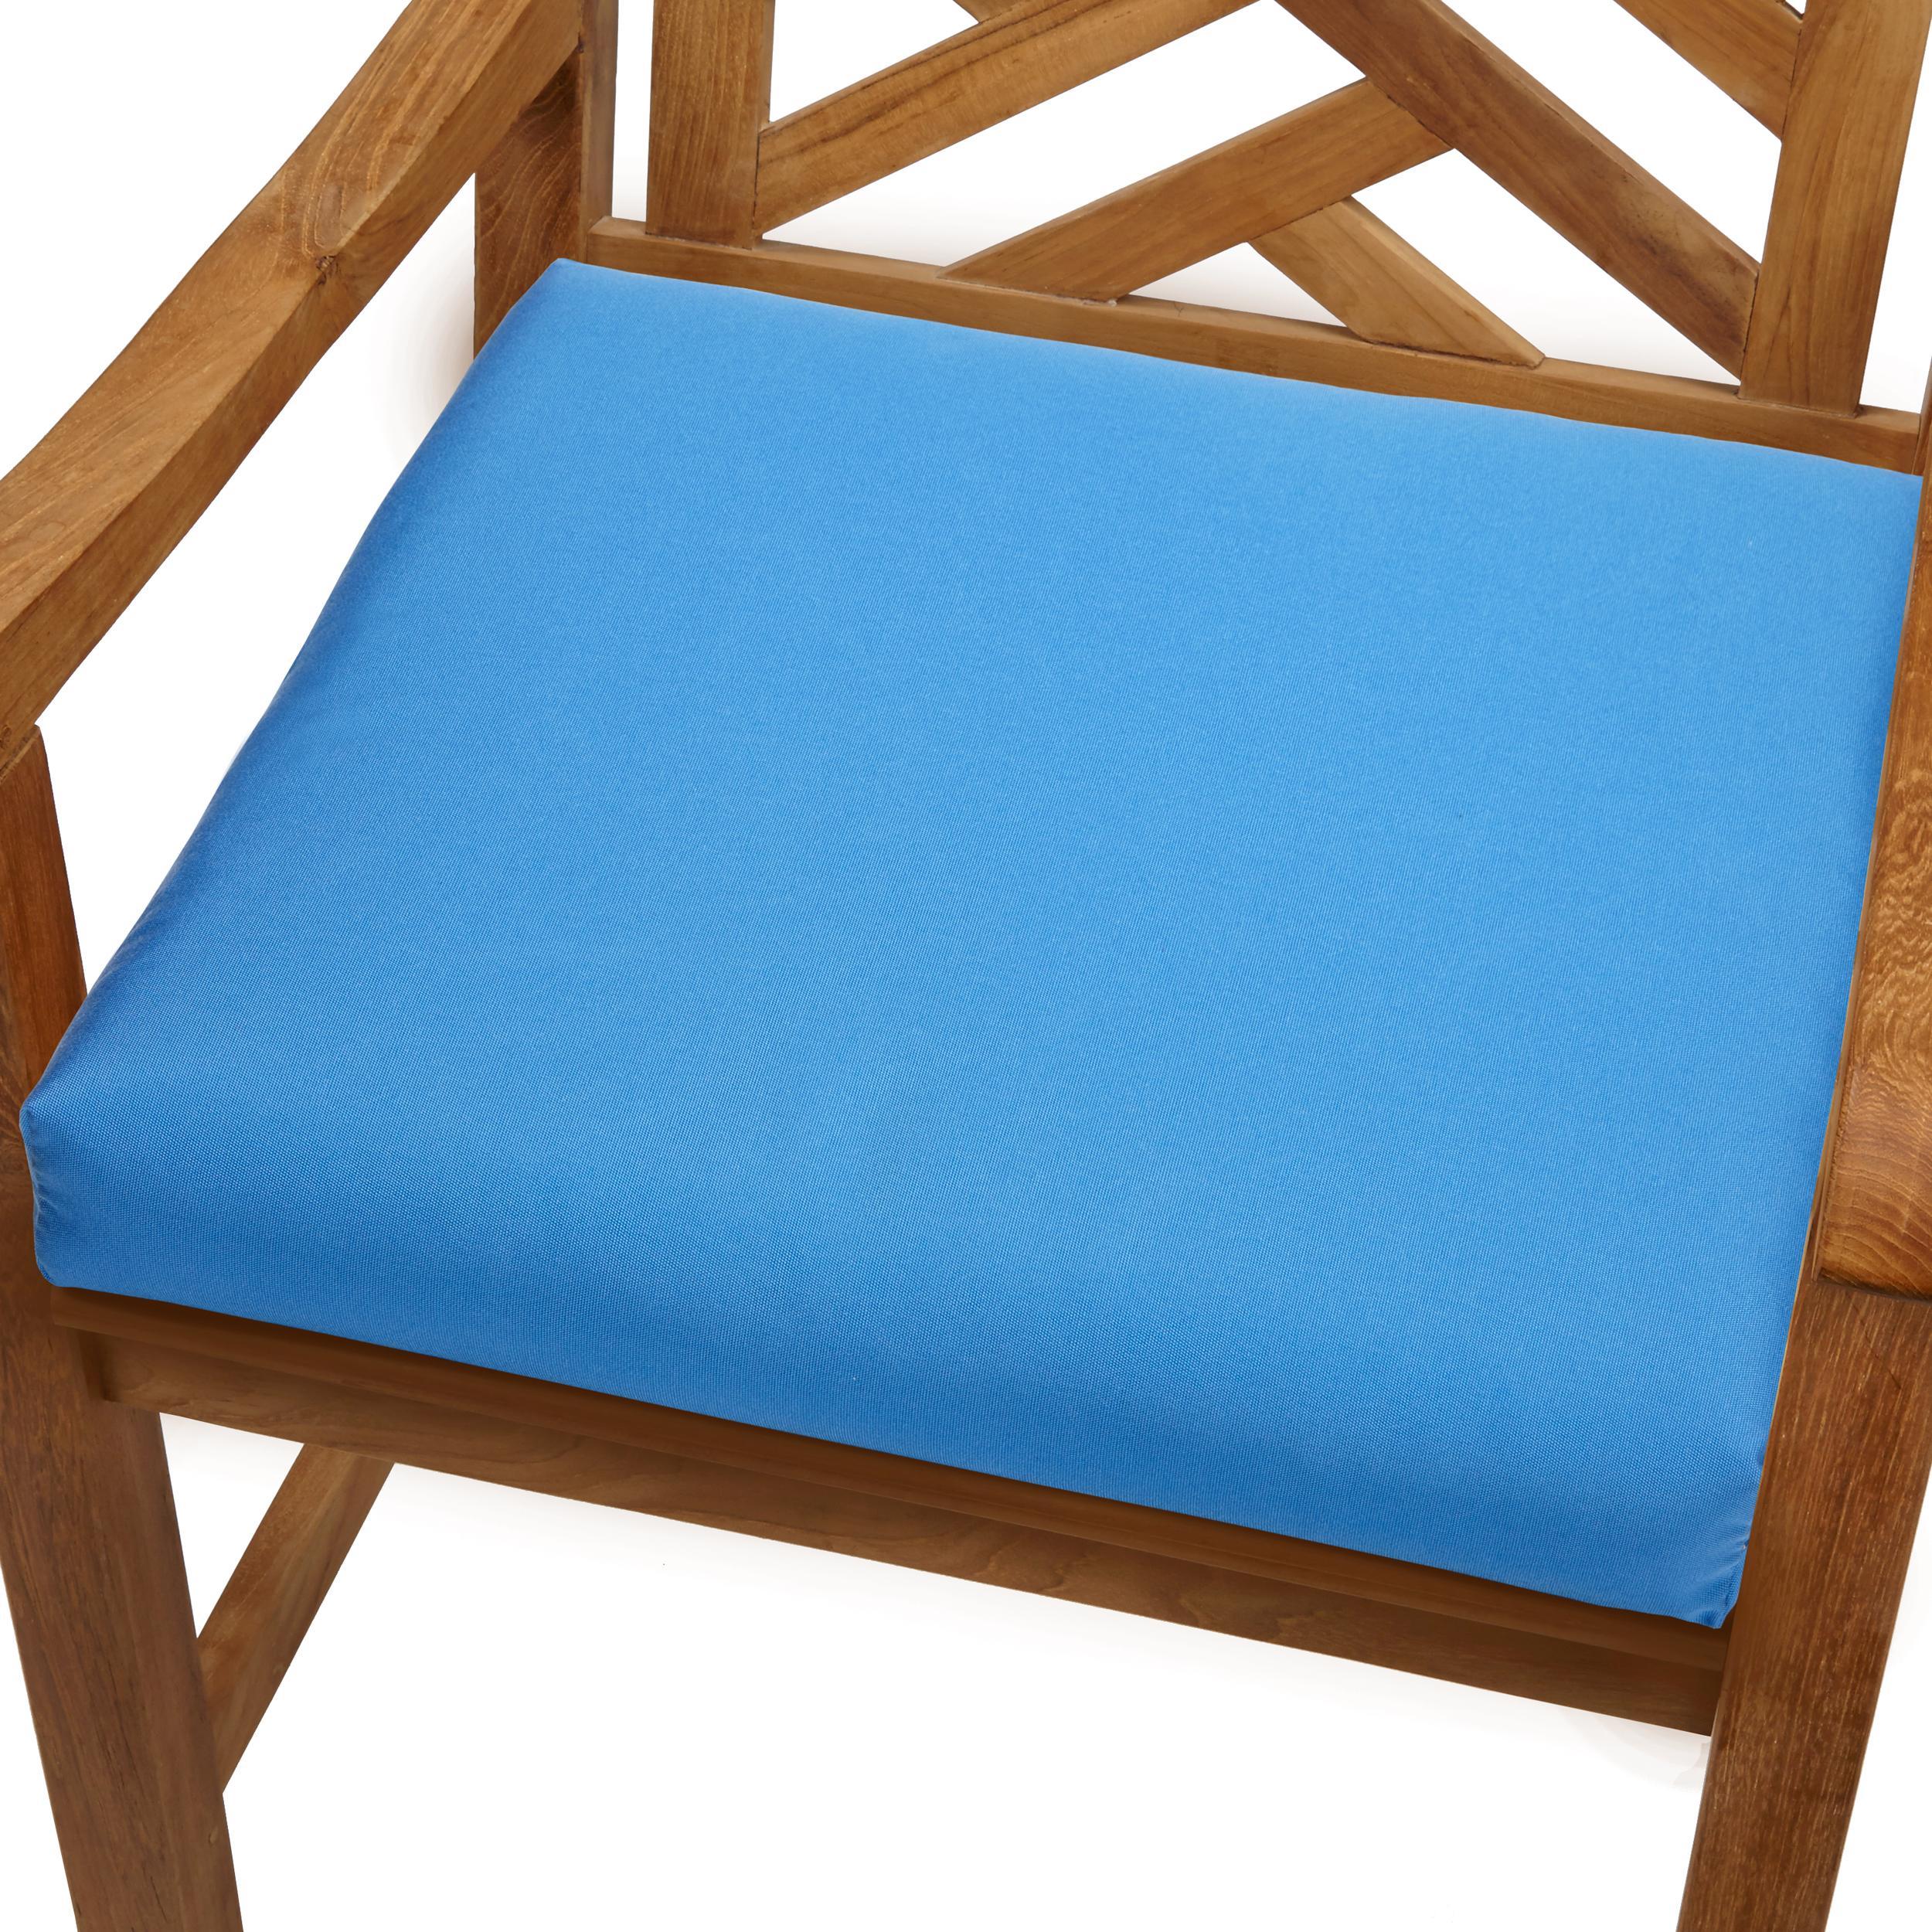 sunbrella outdoor chair cushions mismatched dining chairs amazon mozaic blair indoor cushion 20